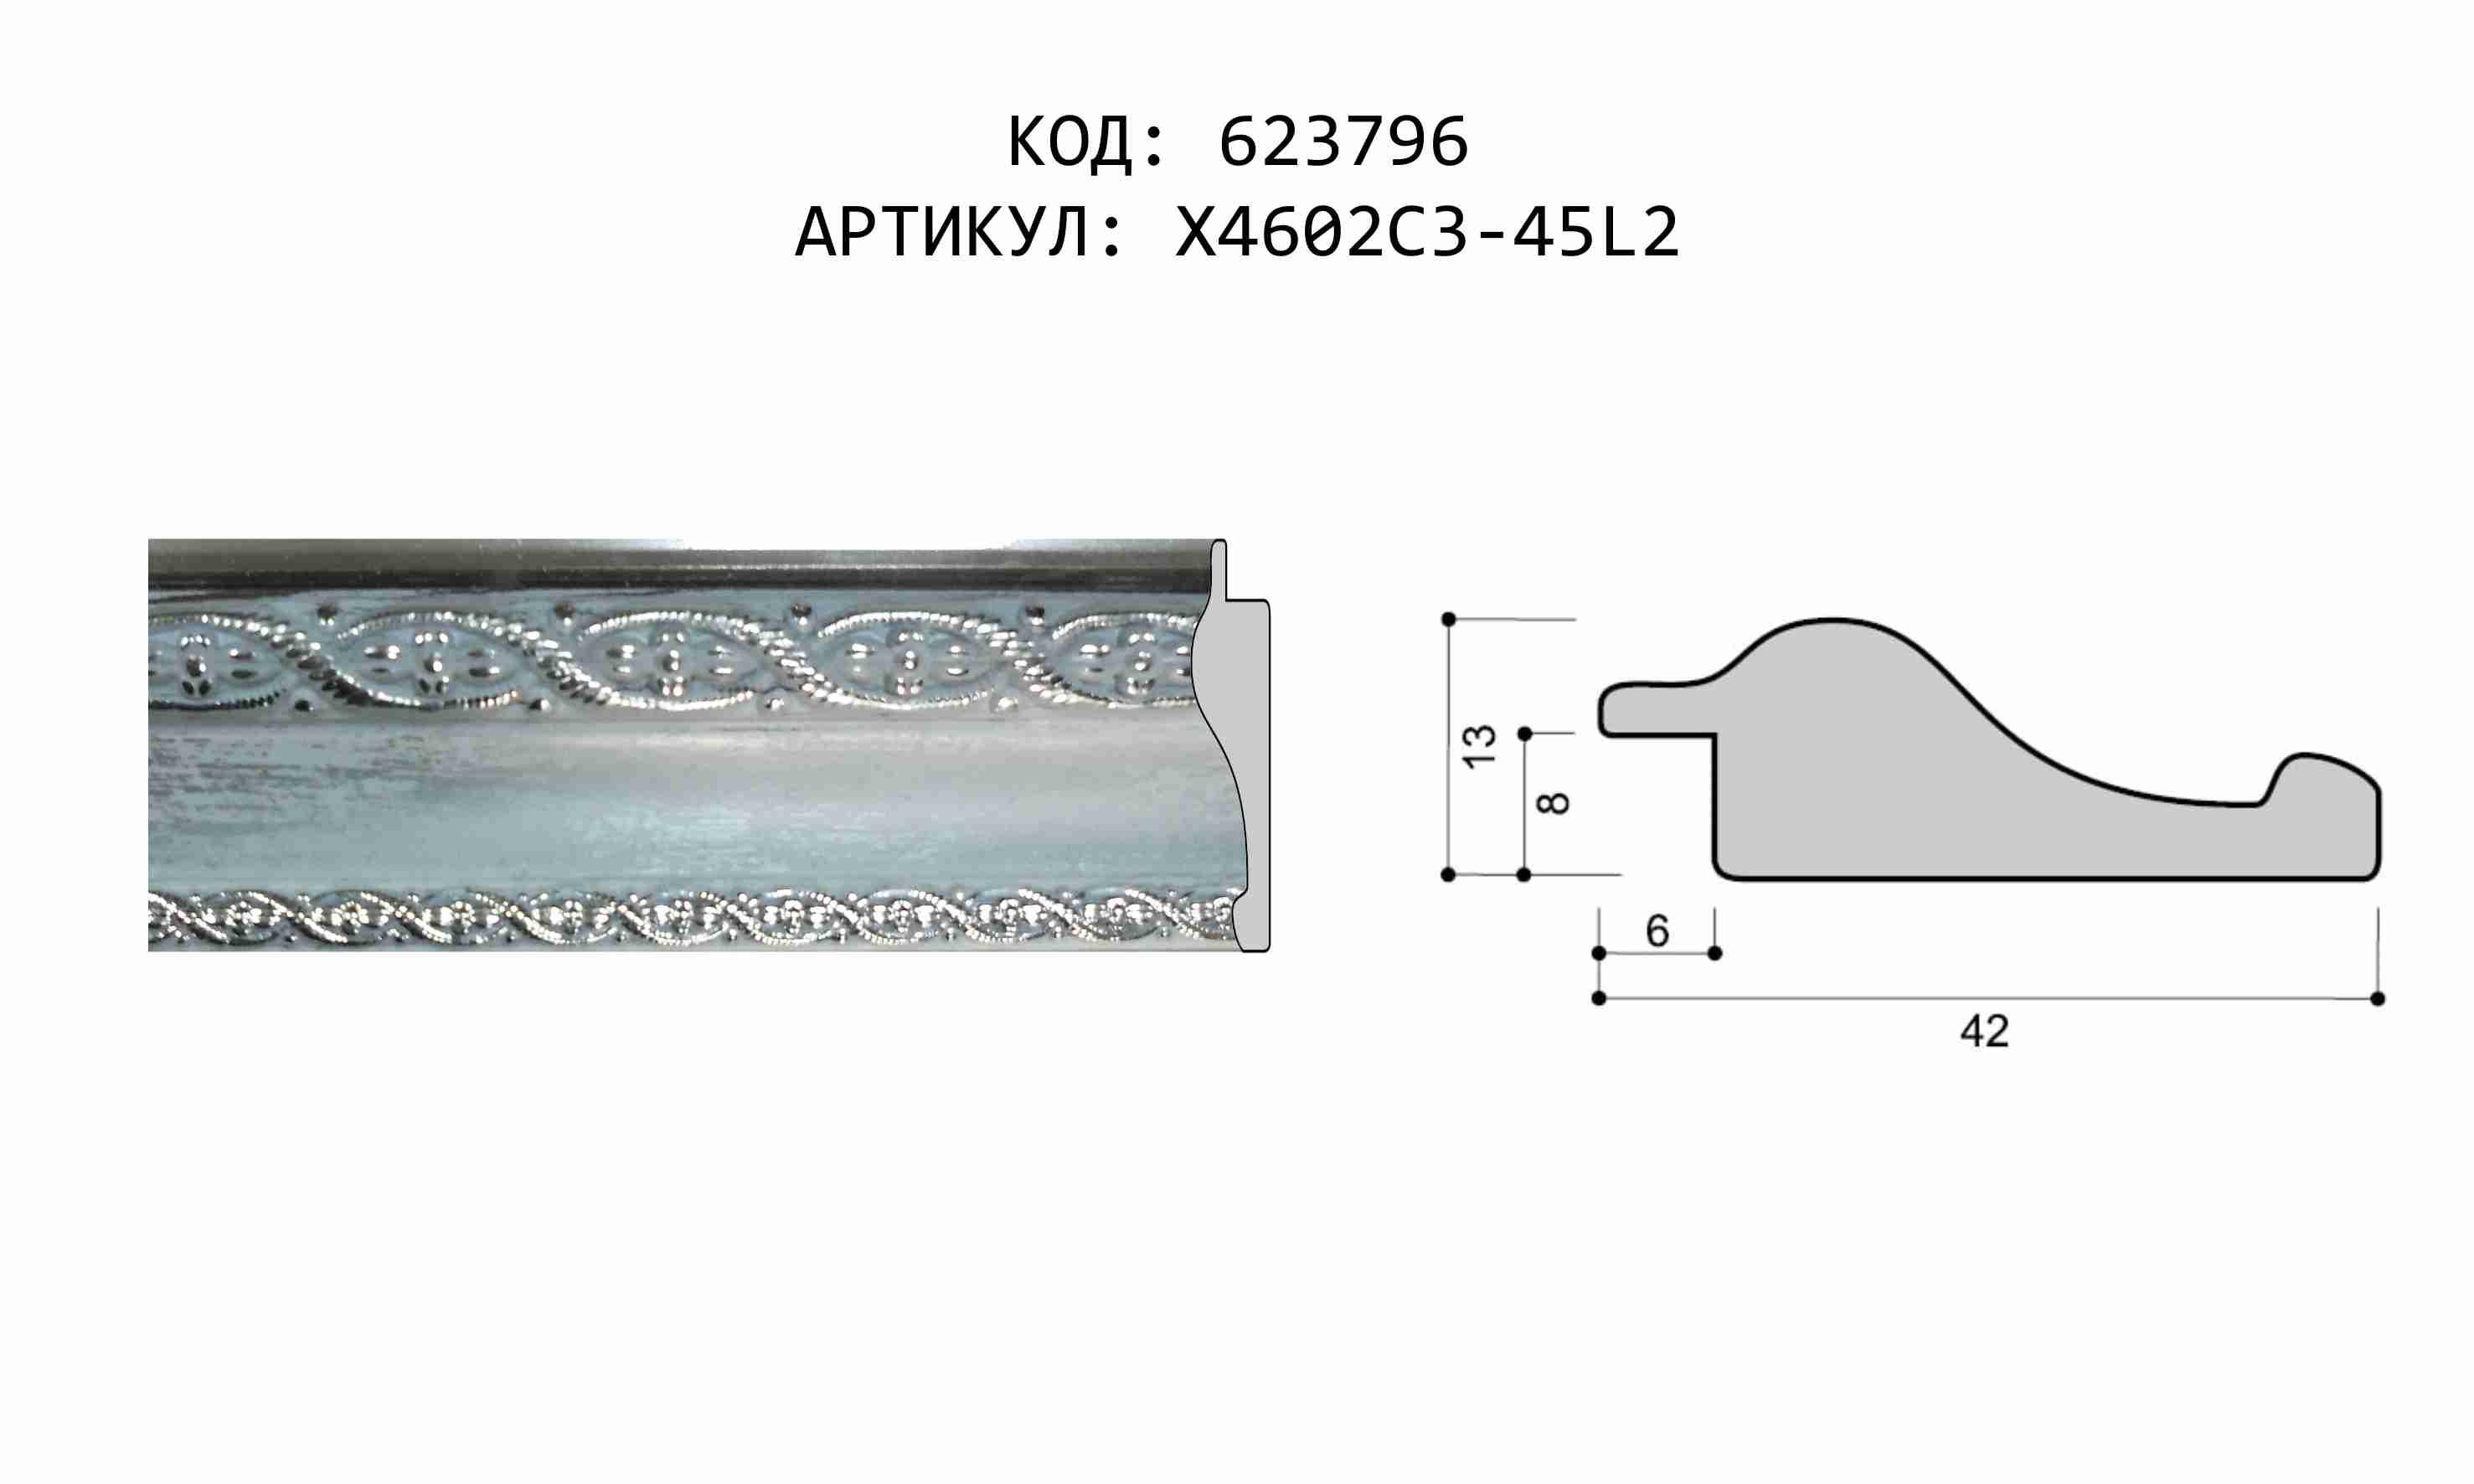 Артикул: X4602C3-45L2